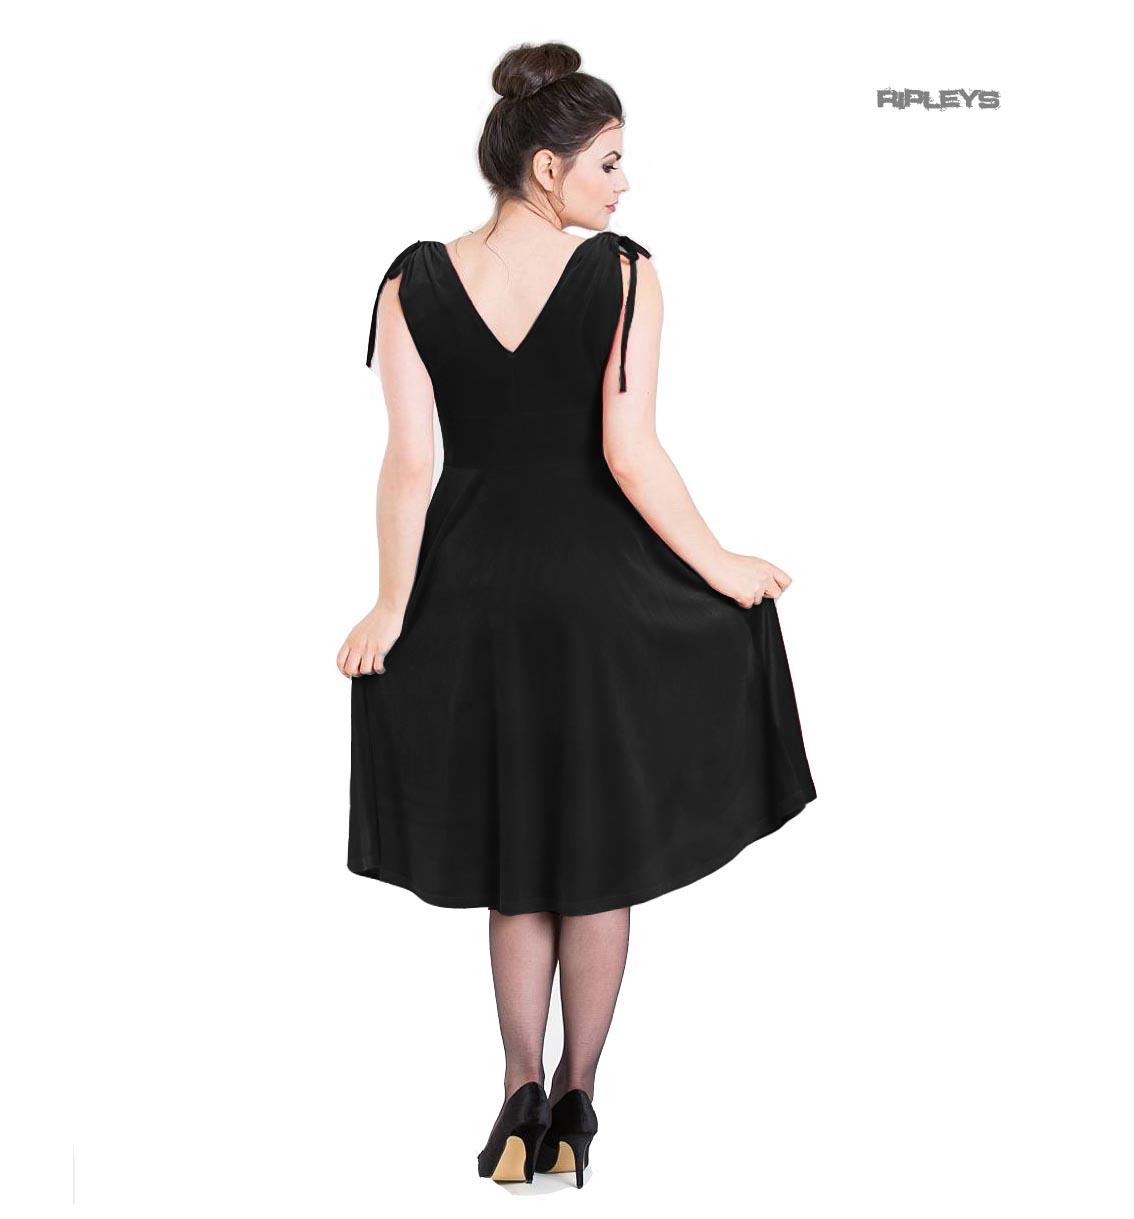 Hell-Bunny-40s-50s-Elegant-Pin-Up-Dress-MELINA-Crushed-Velvet-Black-All-Sizes thumbnail 8